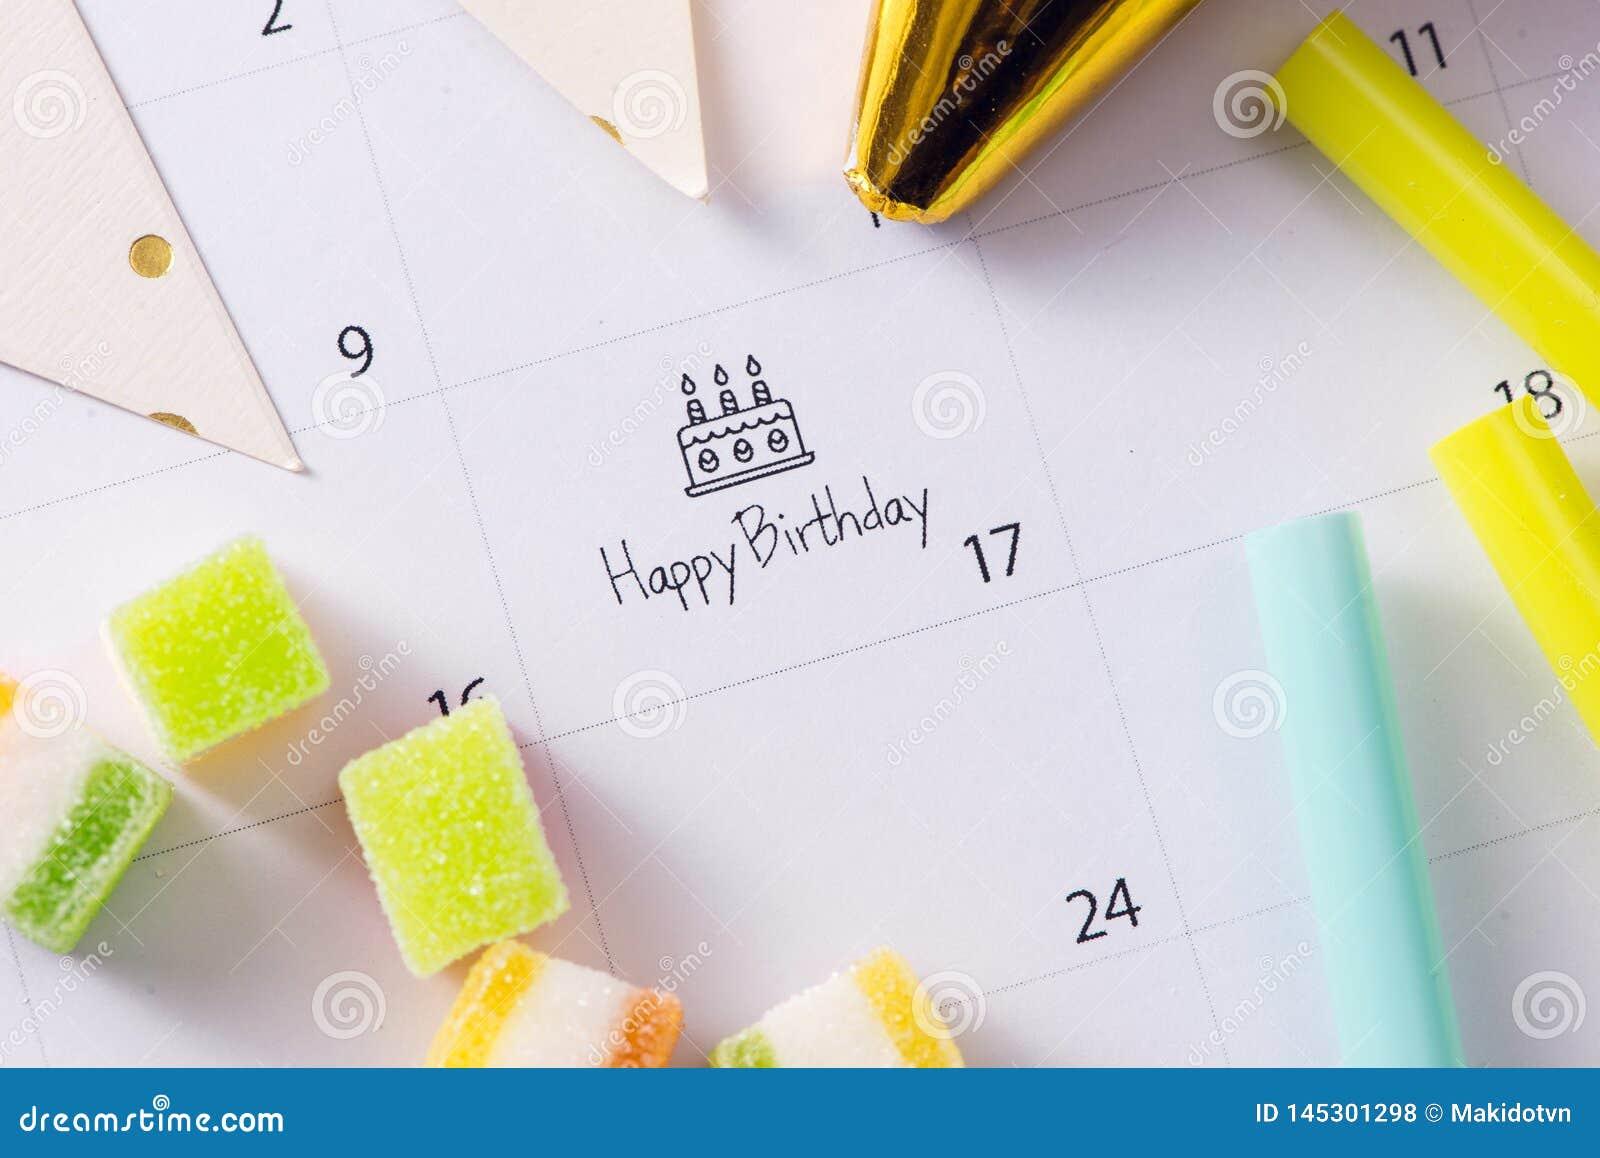 Writing cake on calendar happy birthday